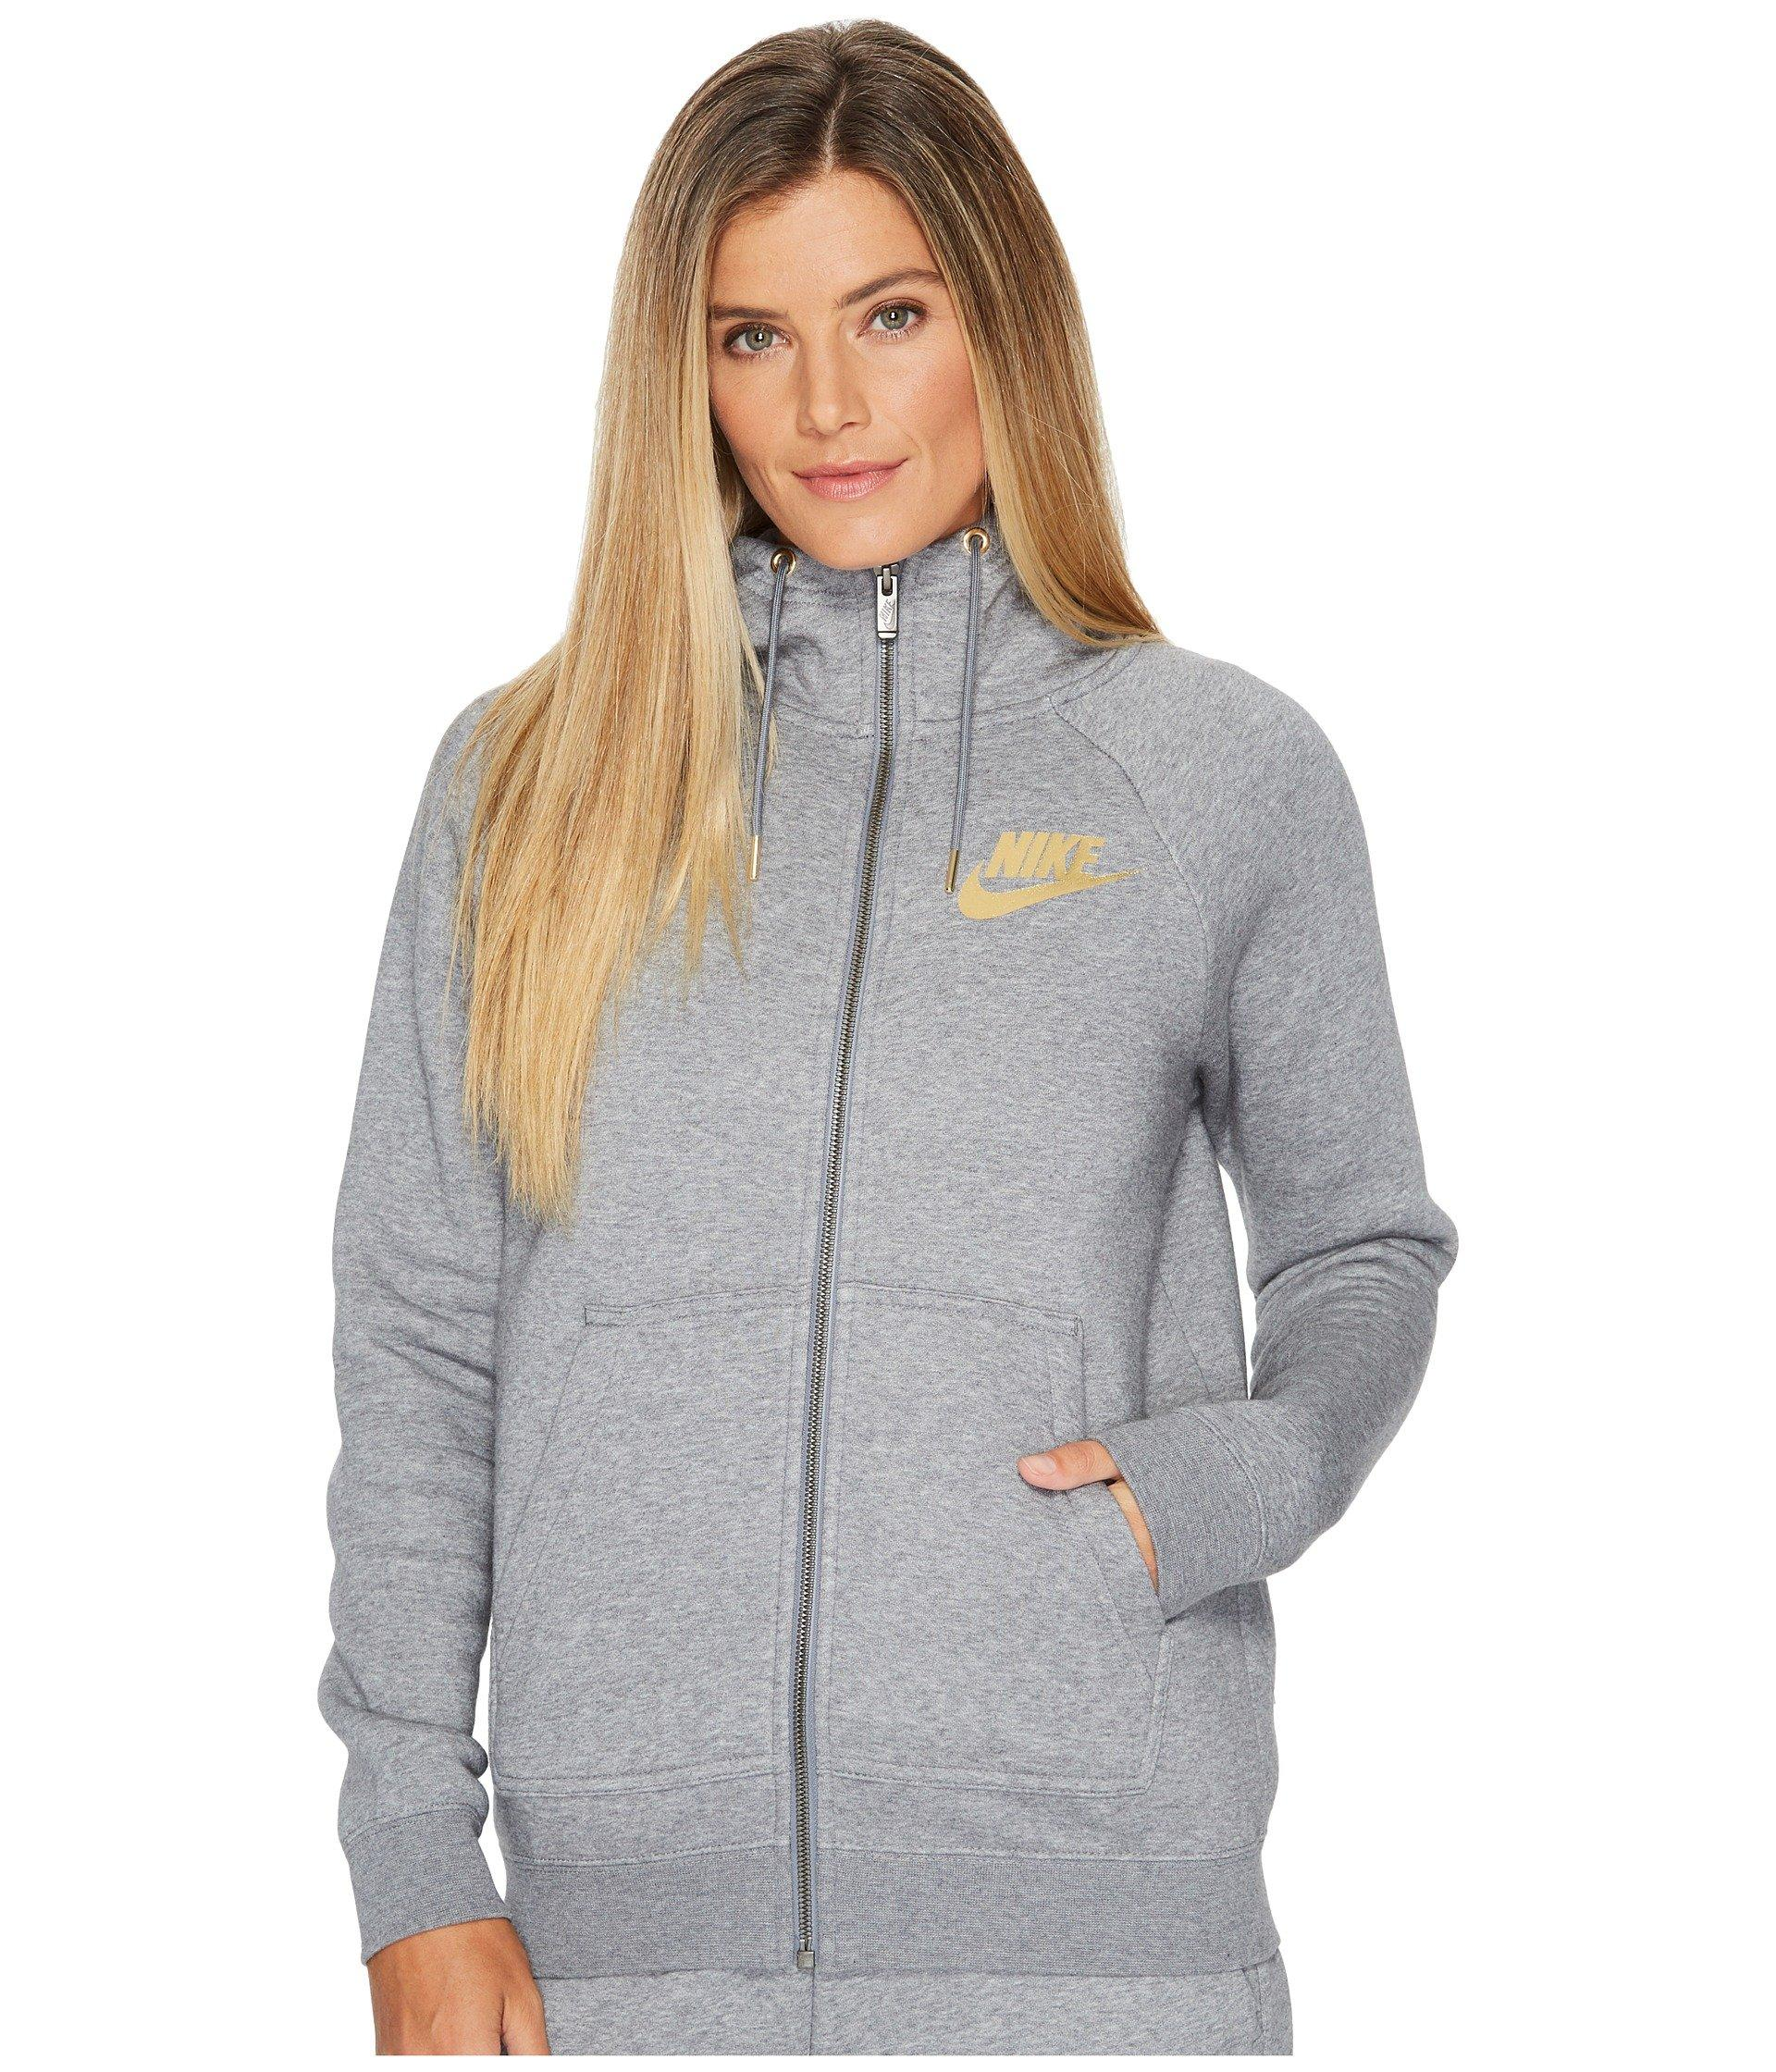 3e51415d4a6f Nike Sportswear Rally Metallic Full-Zip Hoodie